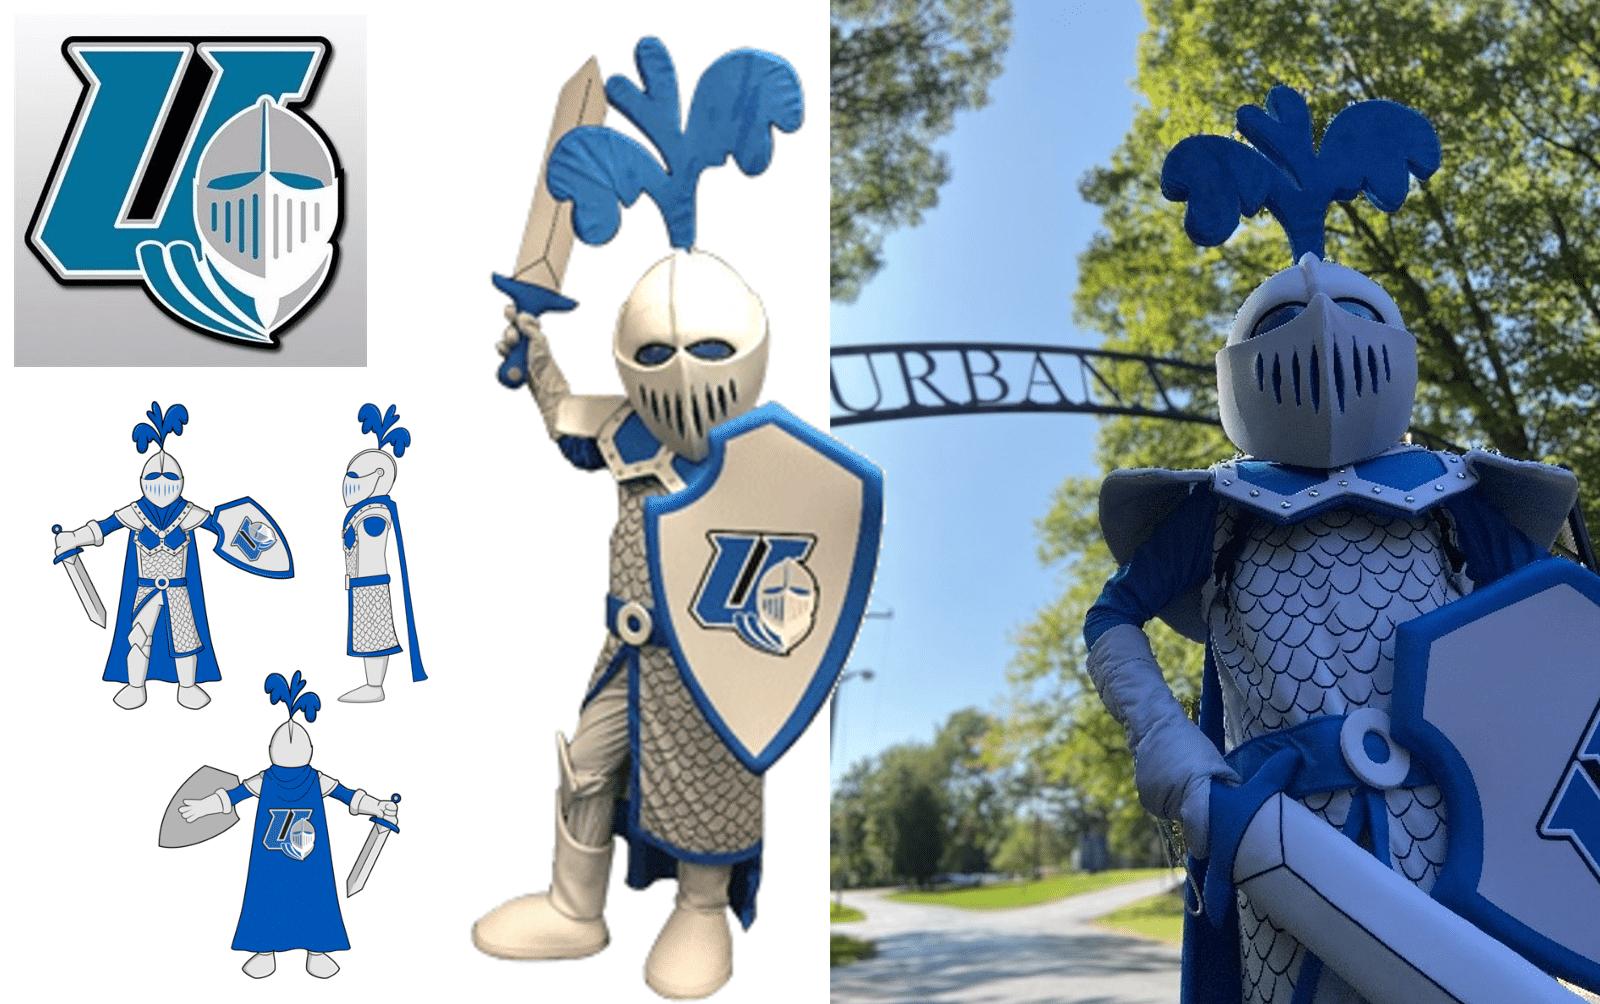 Custom-Mascot-Costume-Knight-Urbana-University-by-Promo-Bears